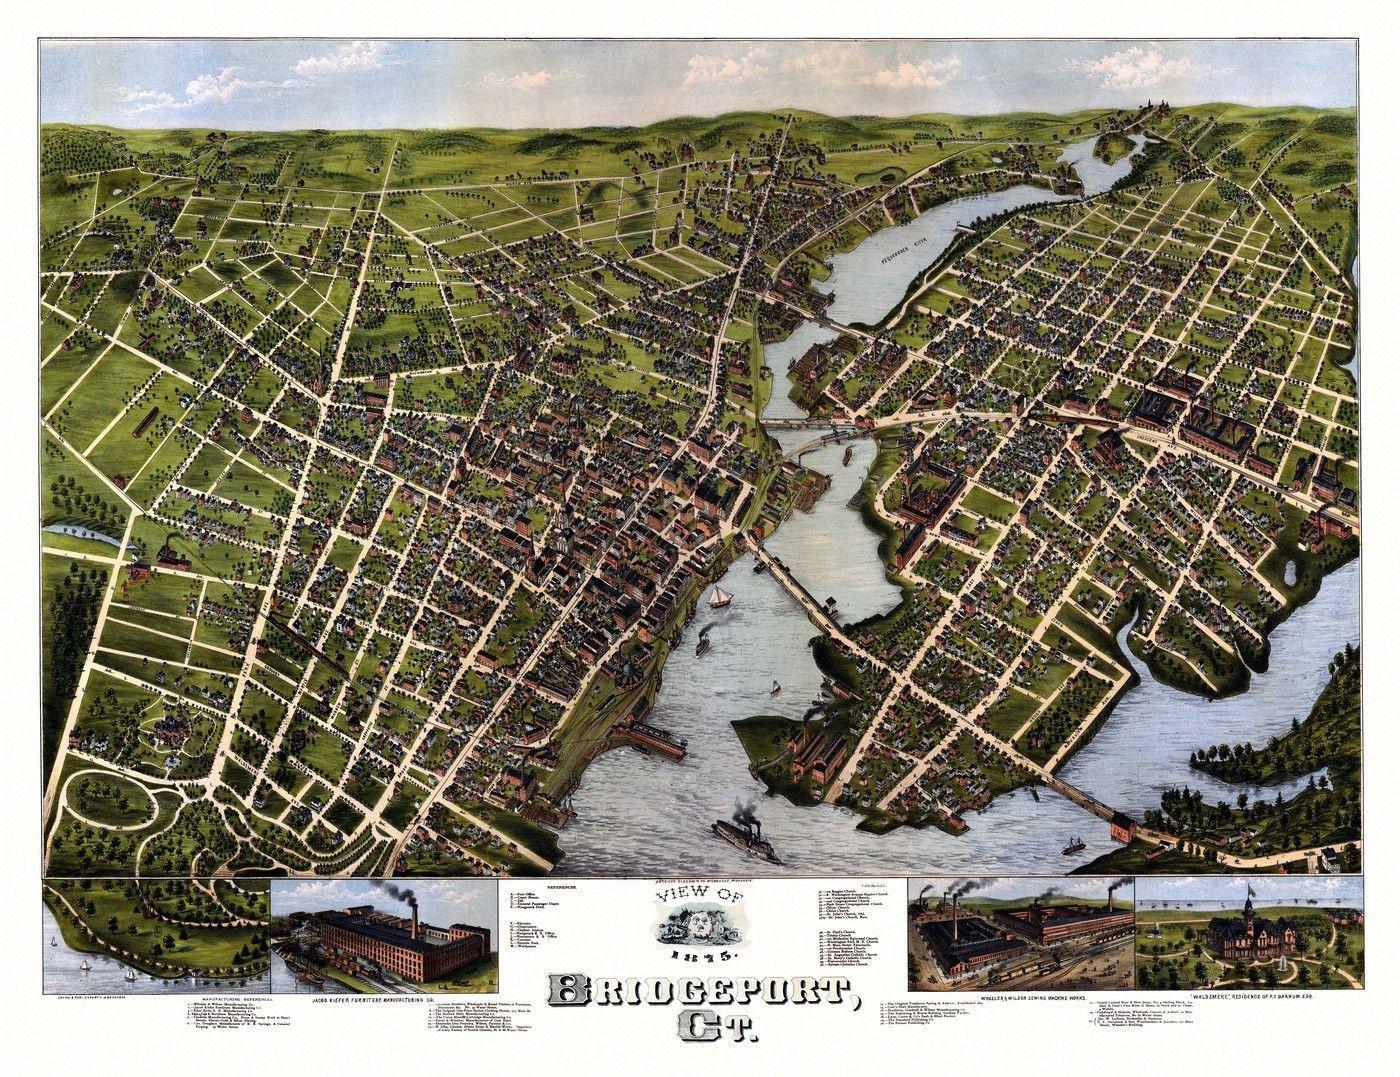 Old Map of Bridgeport Connecticut 1875 Fairfield